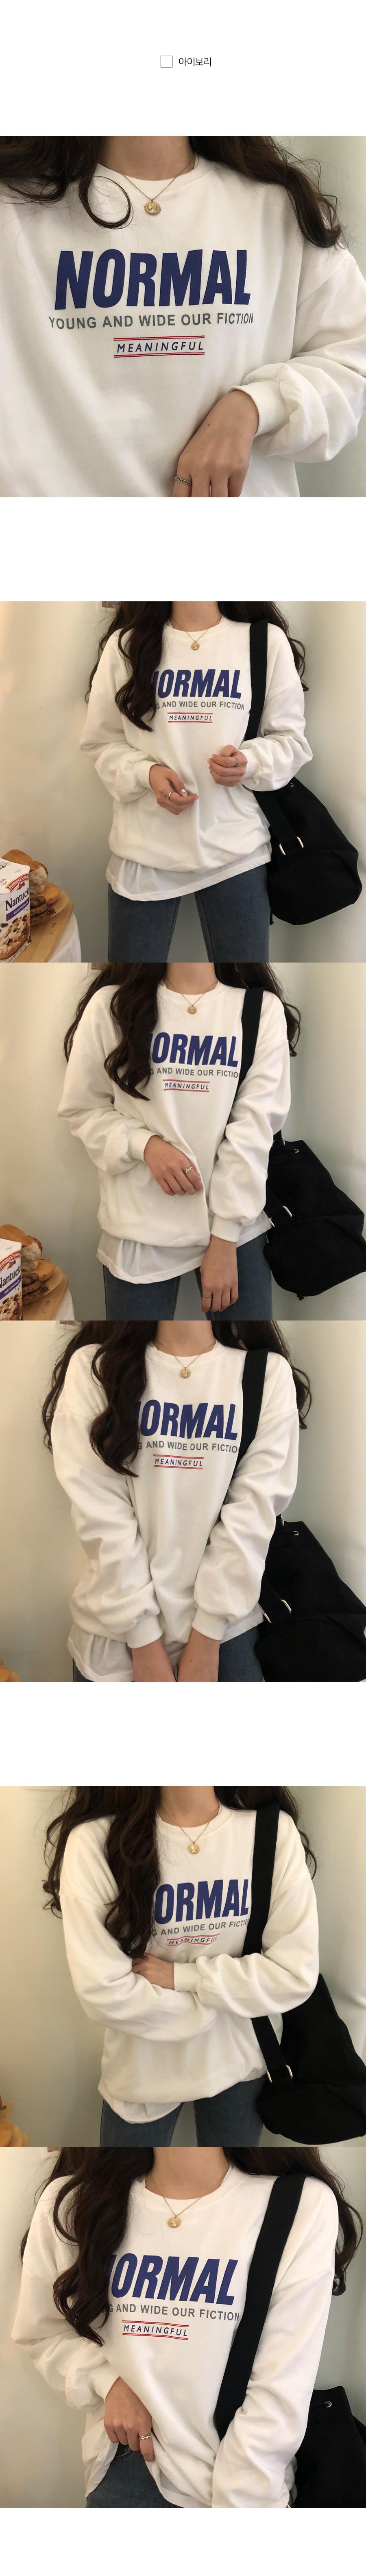 Normal Lettering Overfit Sweatshirt